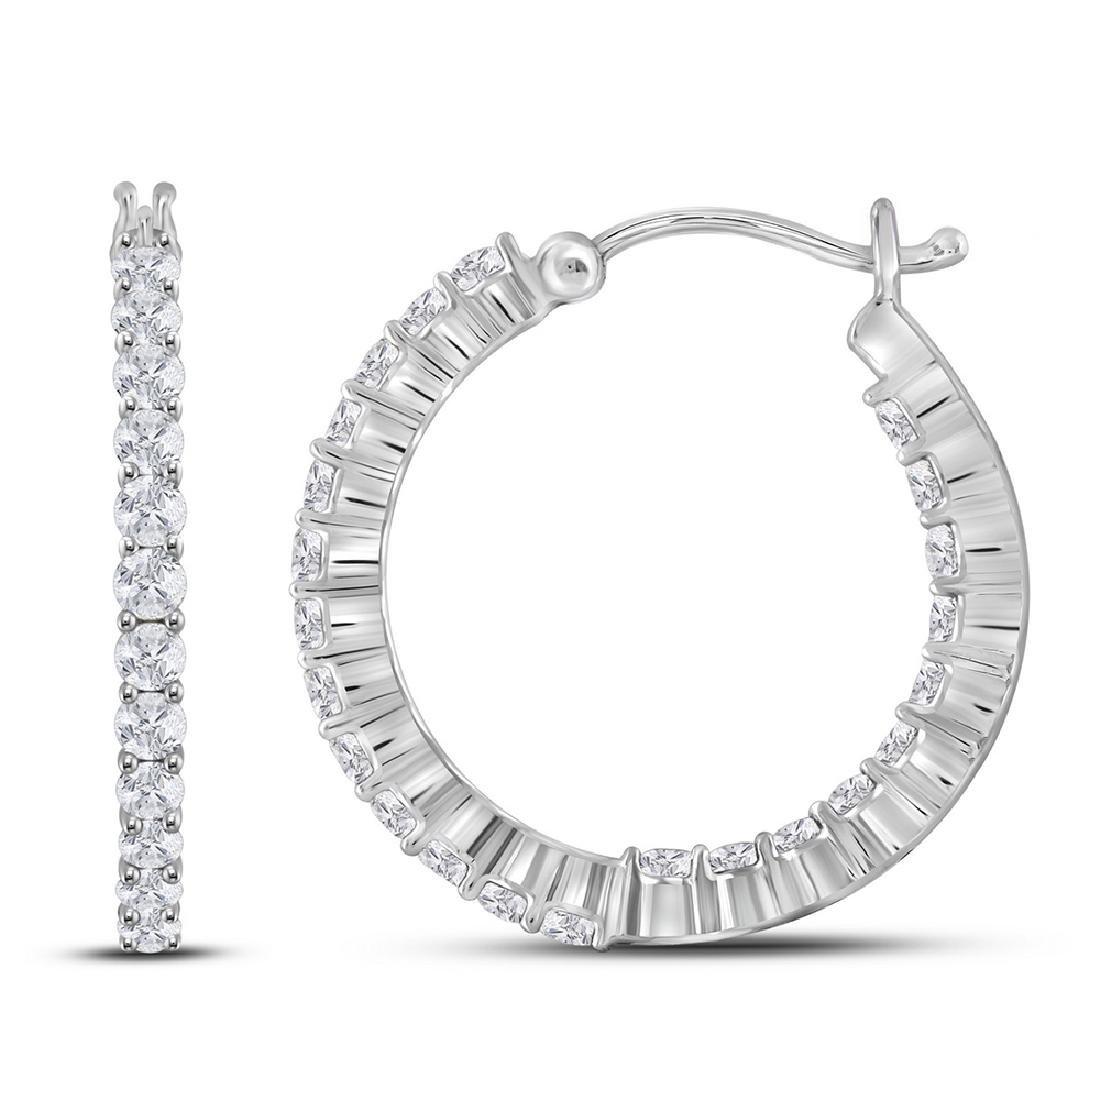 0.53 CTW Diamond Single Row Hoop Earrings 14KT White